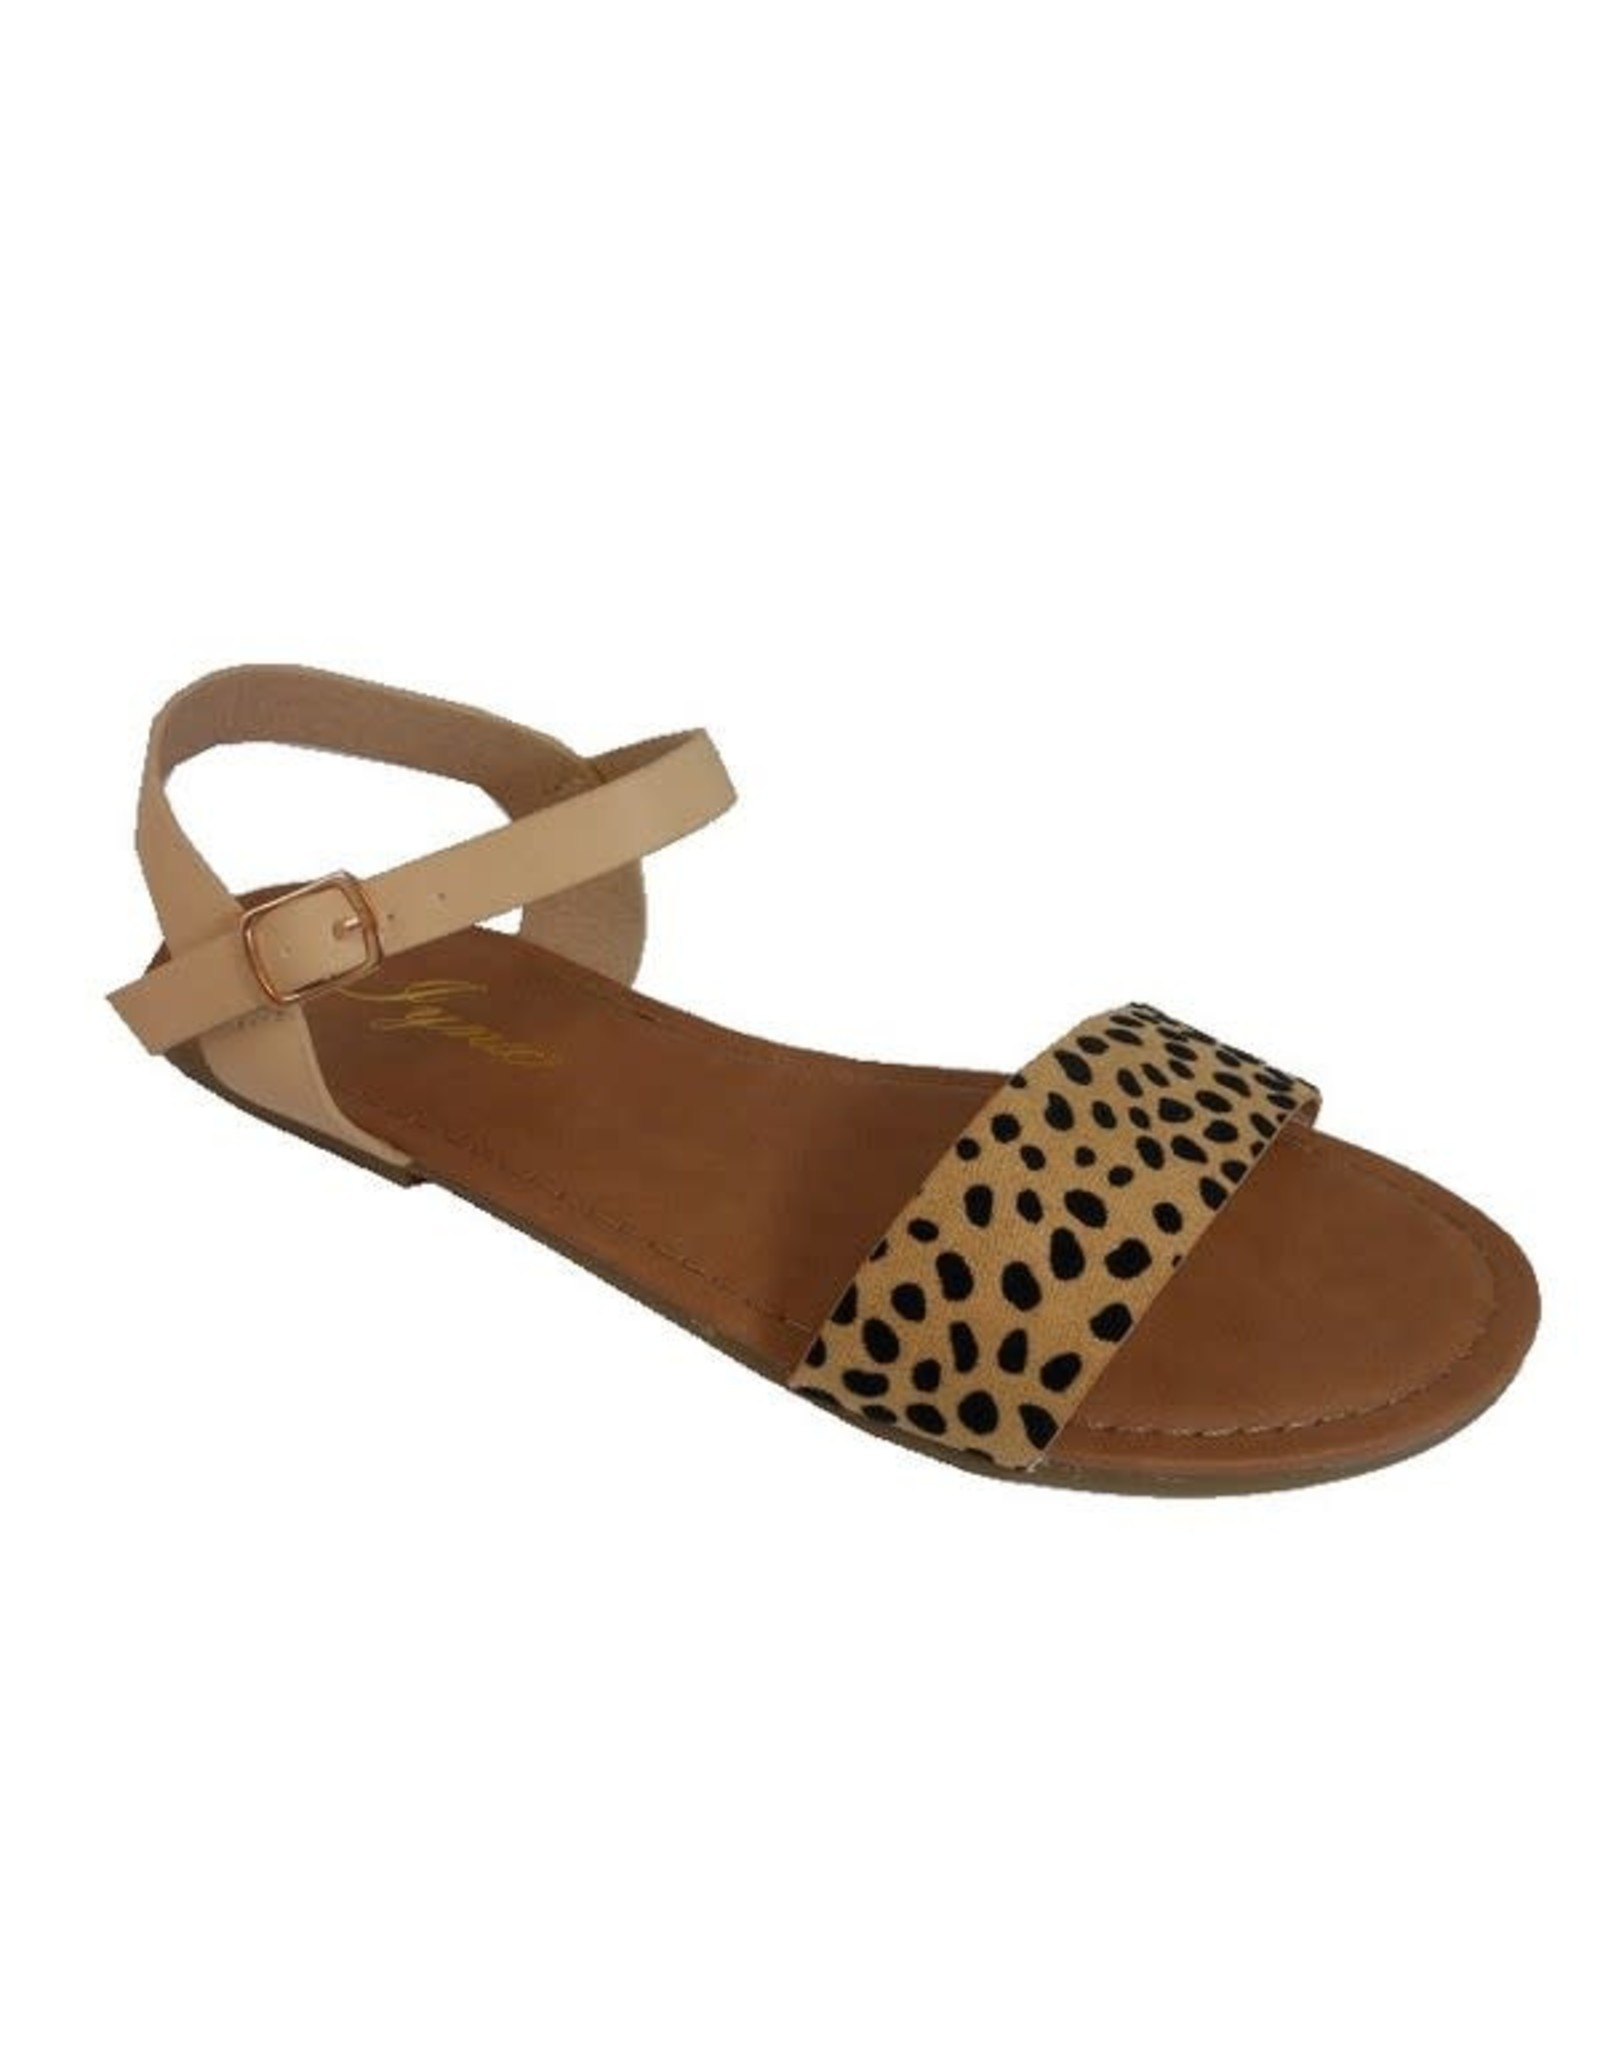 Red Shoe Lover ANNA Leopard Sandals